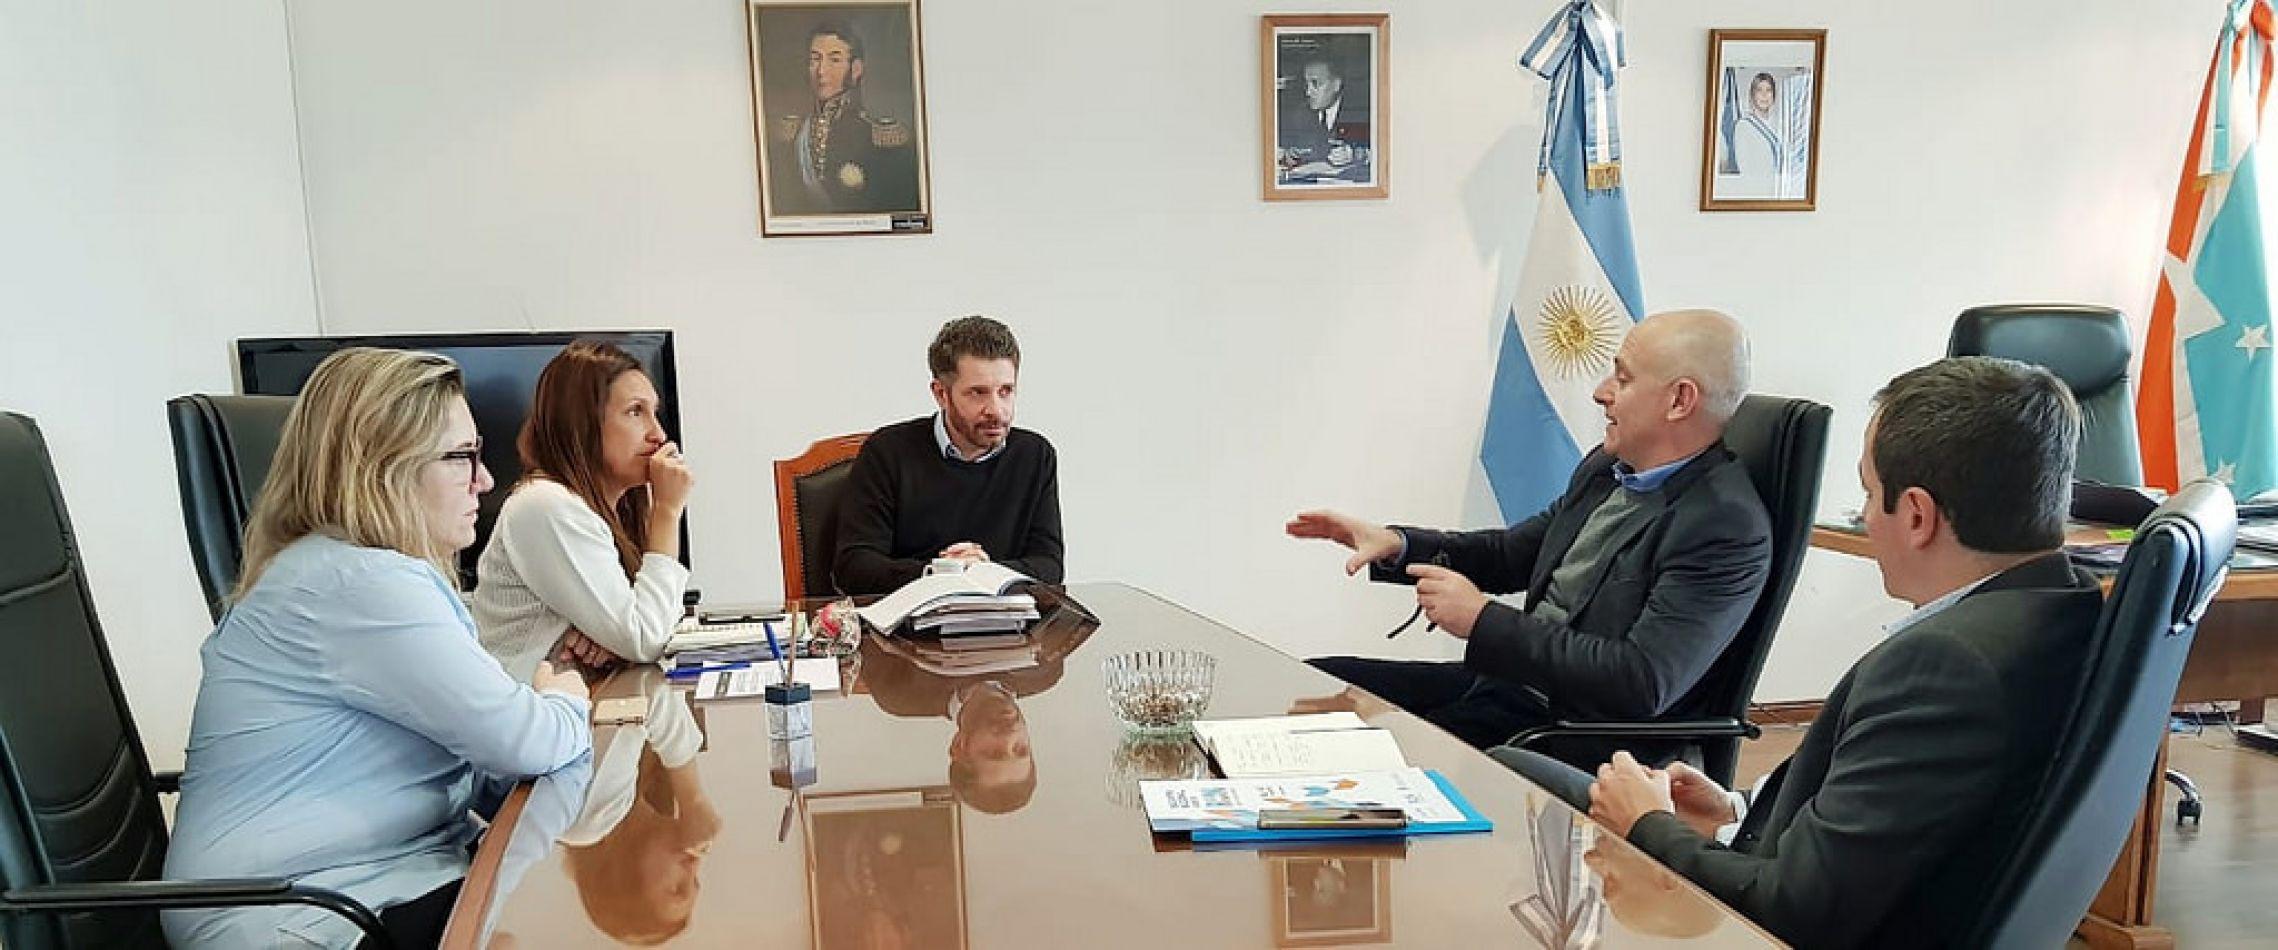 Leonardo Gorbacz en reunión con Paula Gargiulo, Maricel Barone,Sebastián Waisgrais  y, Hernán Monath